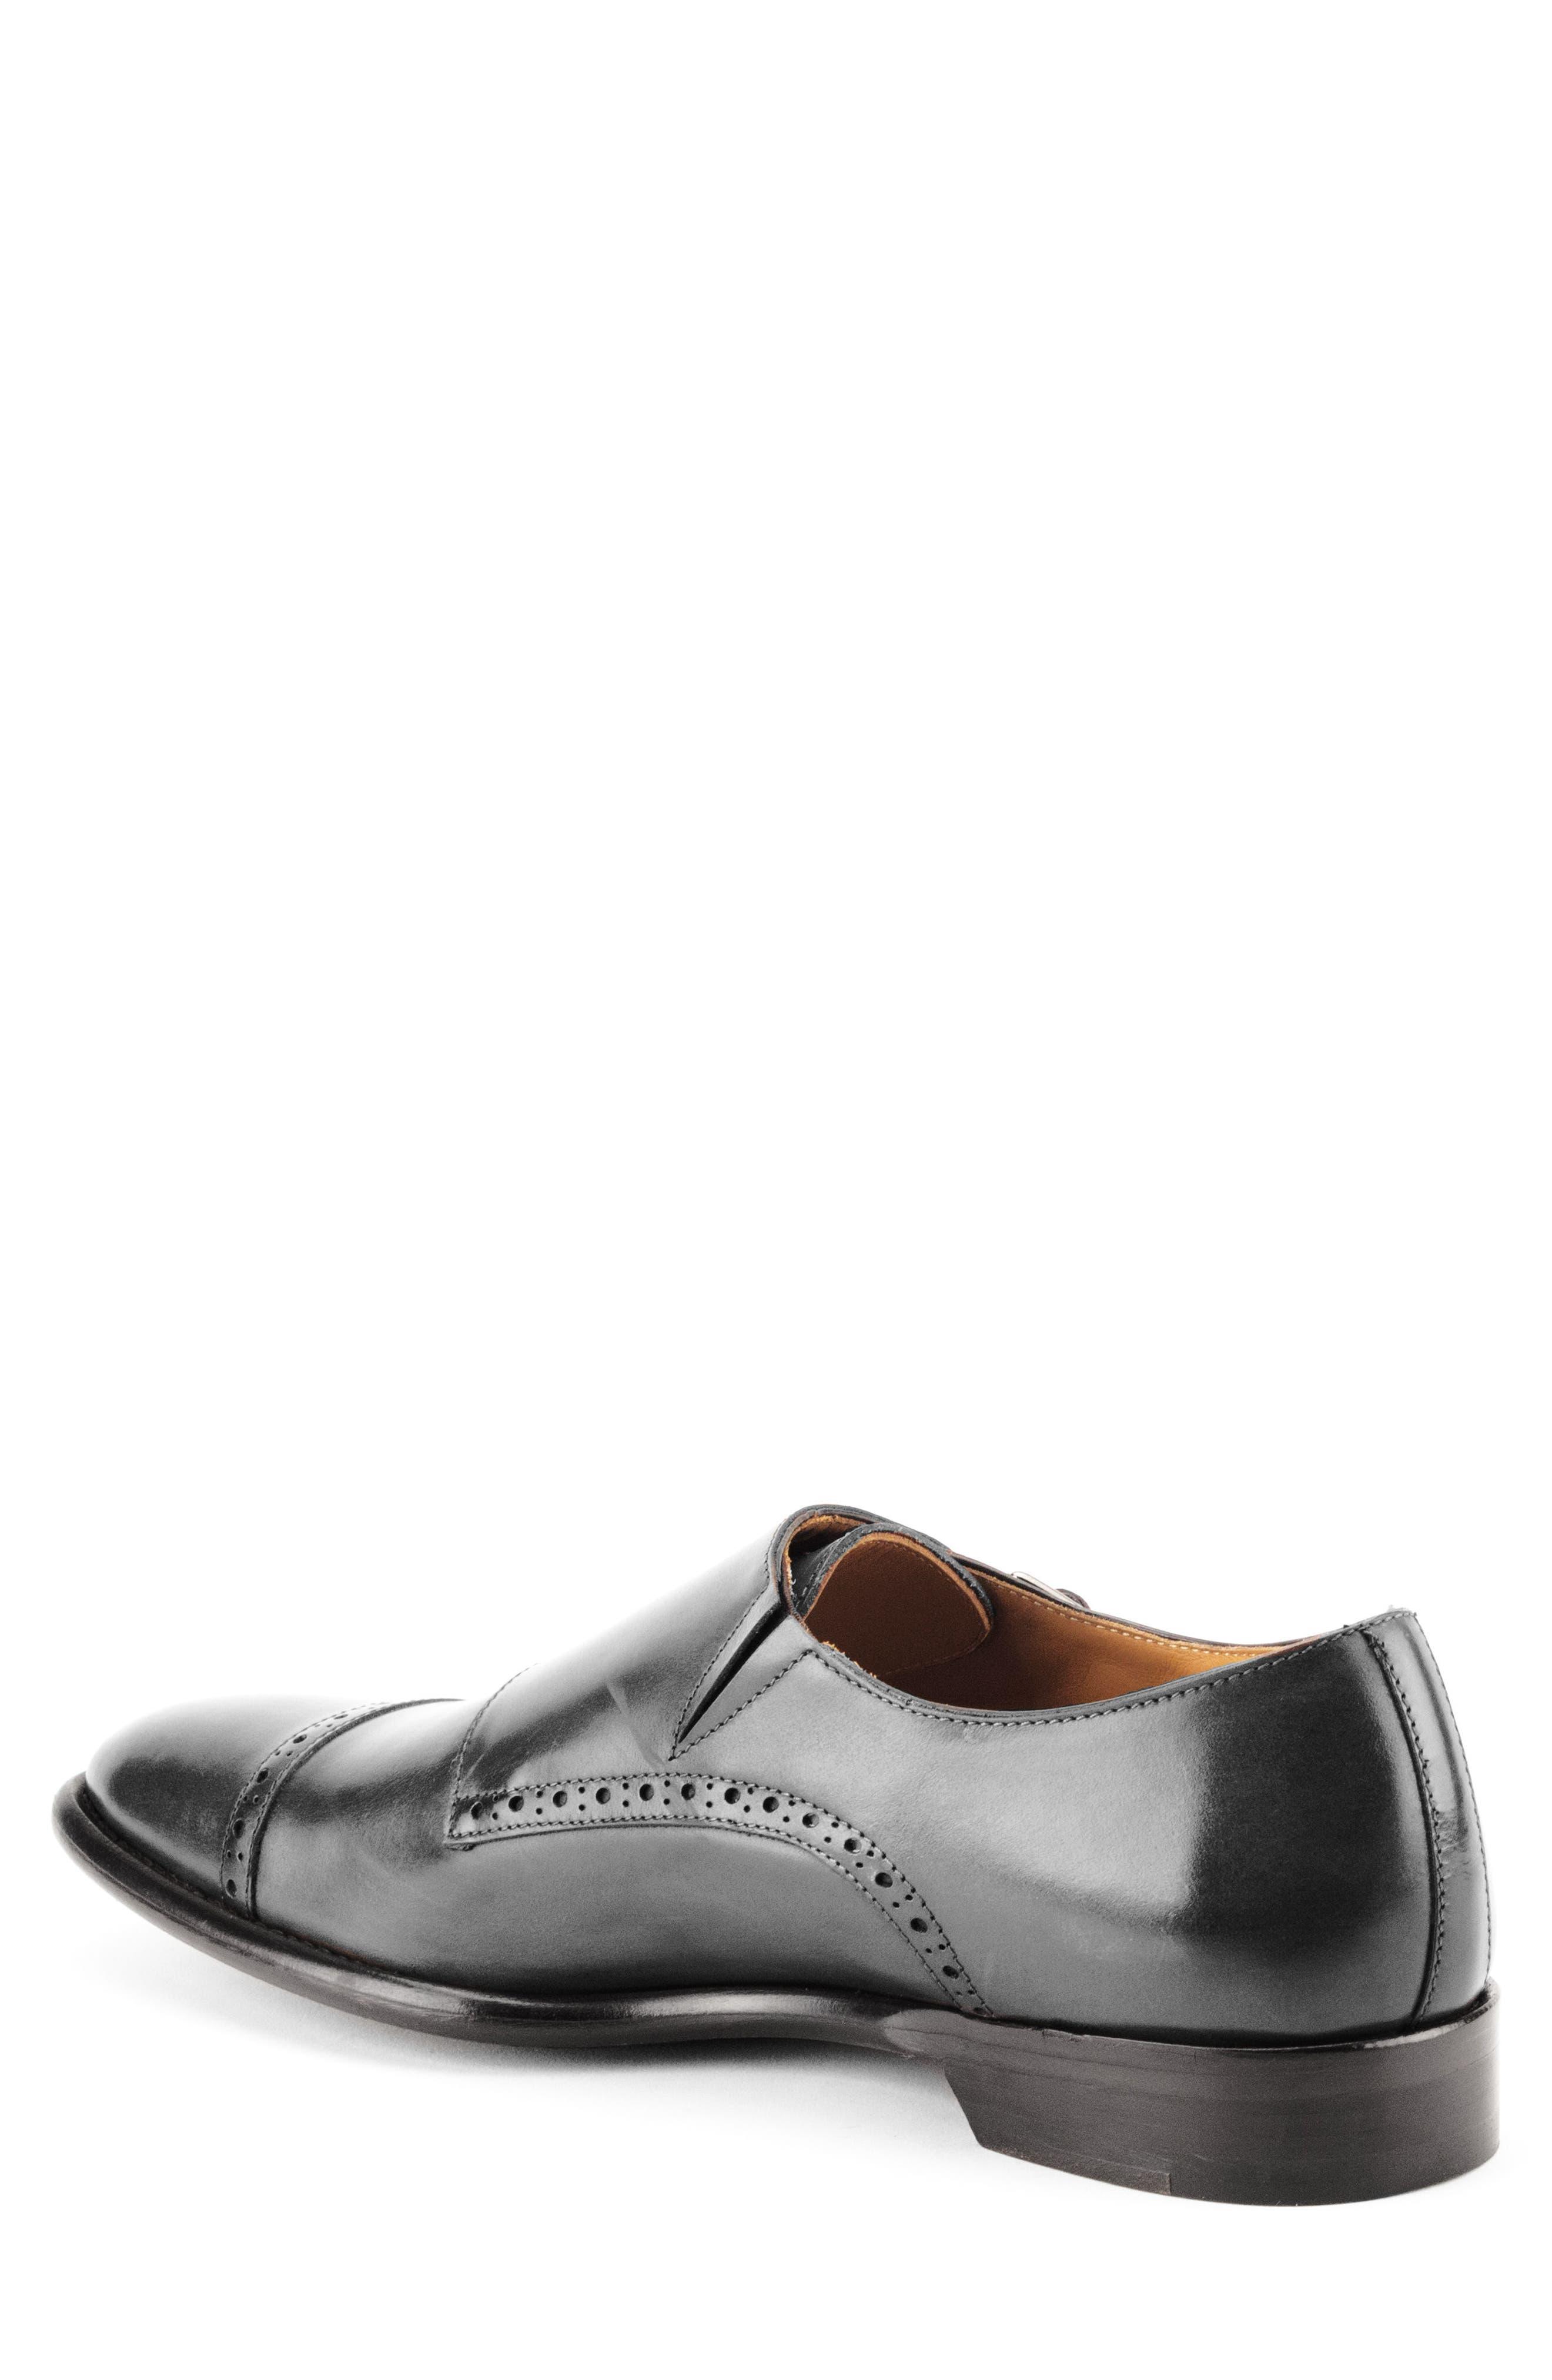 Corbett Cap Toe Double Strap Monk Shoe,                             Alternate thumbnail 2, color,                             001